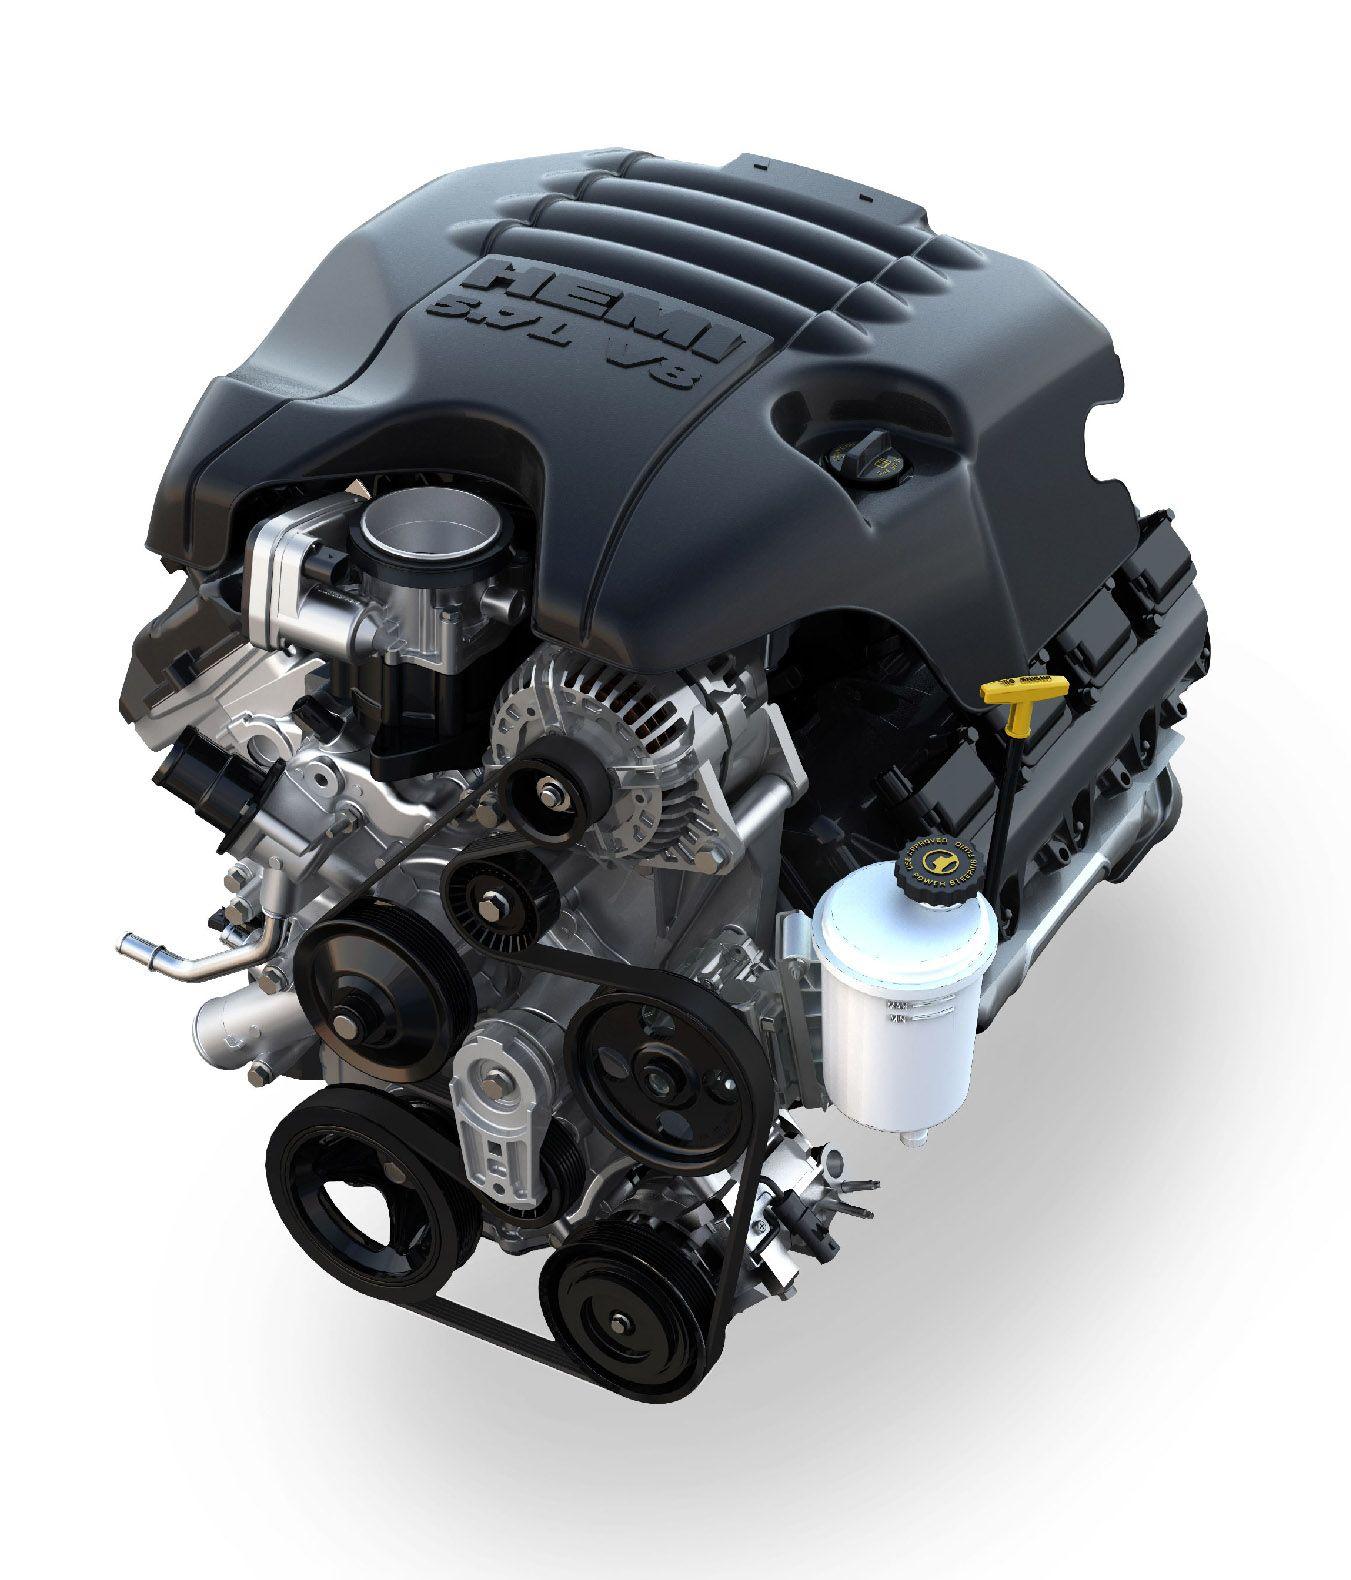 Ram 1500 5 7l V8 Hemi Engine 11 Engineering Hemi Engine Hemi